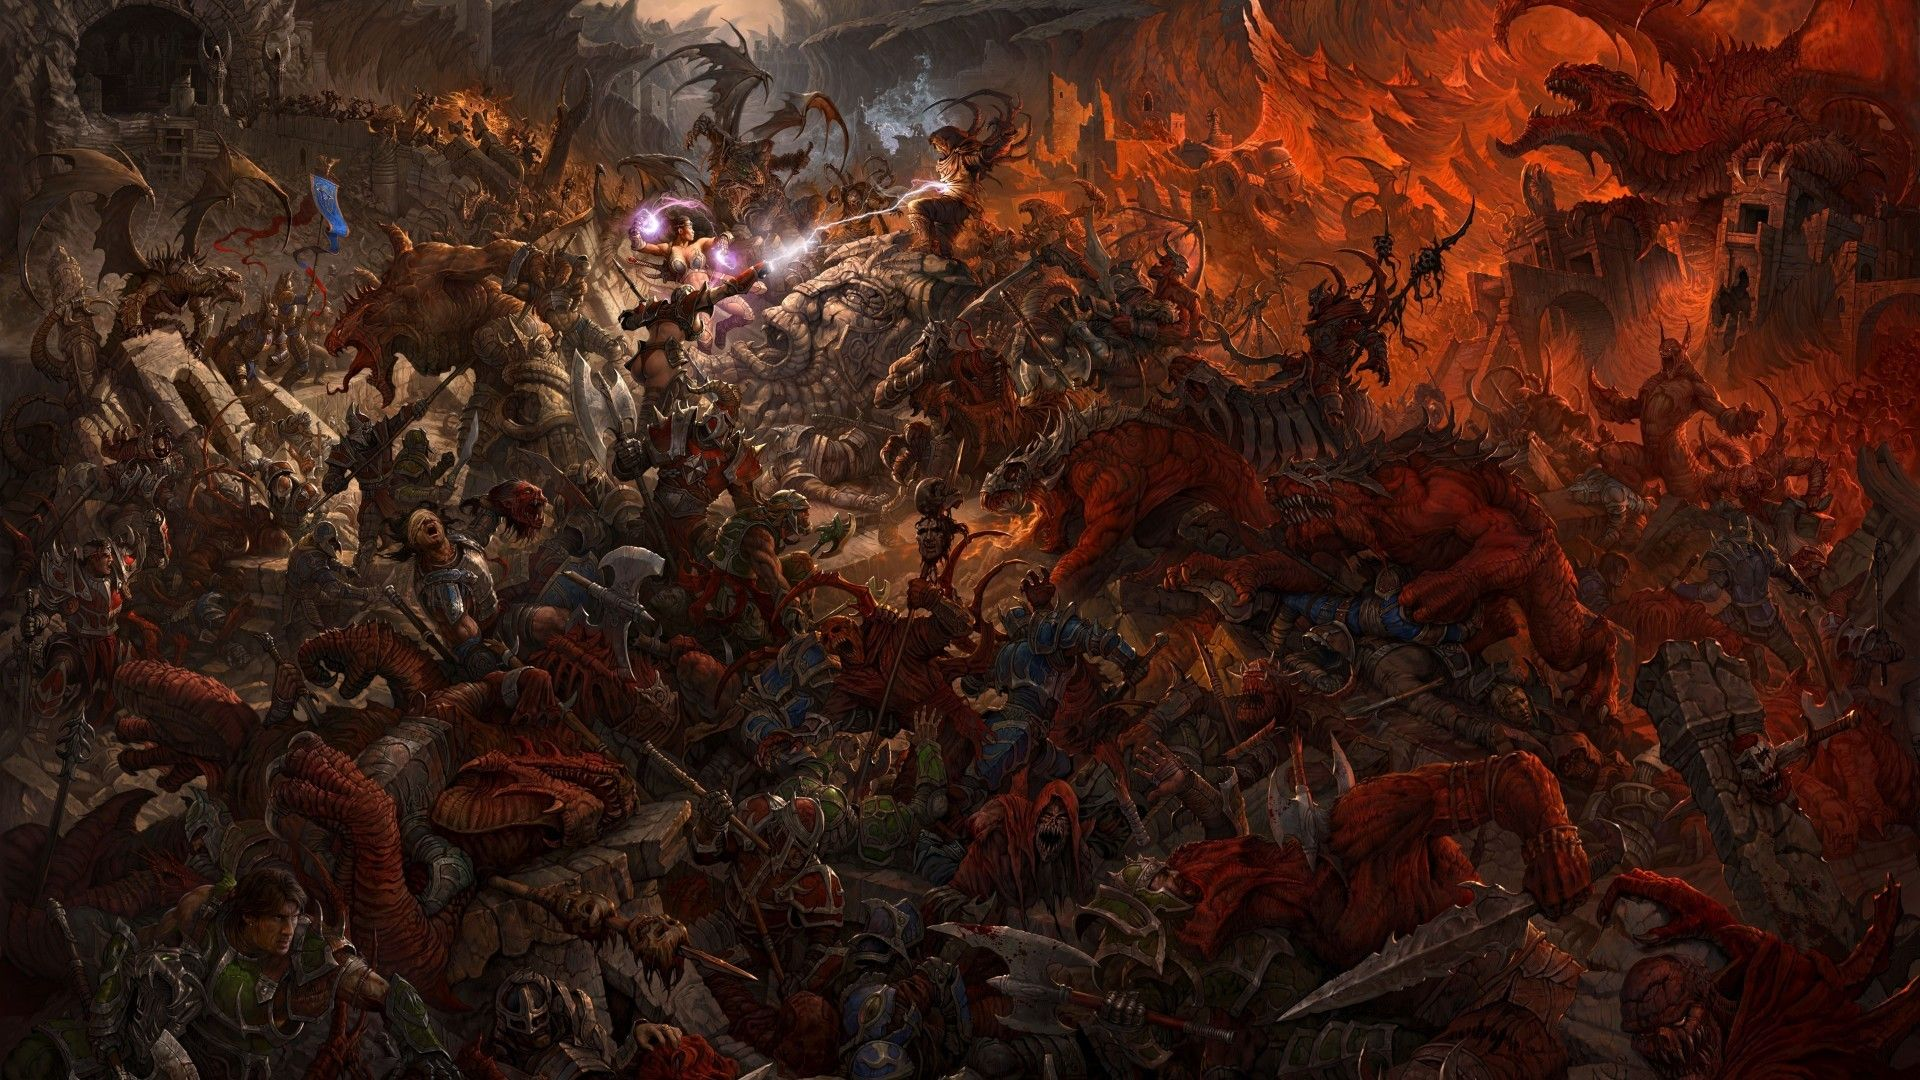 Warhammer War Battles Wallpaper 24445 Wallhaven Cc Fantasy Paintings Art Fantasy